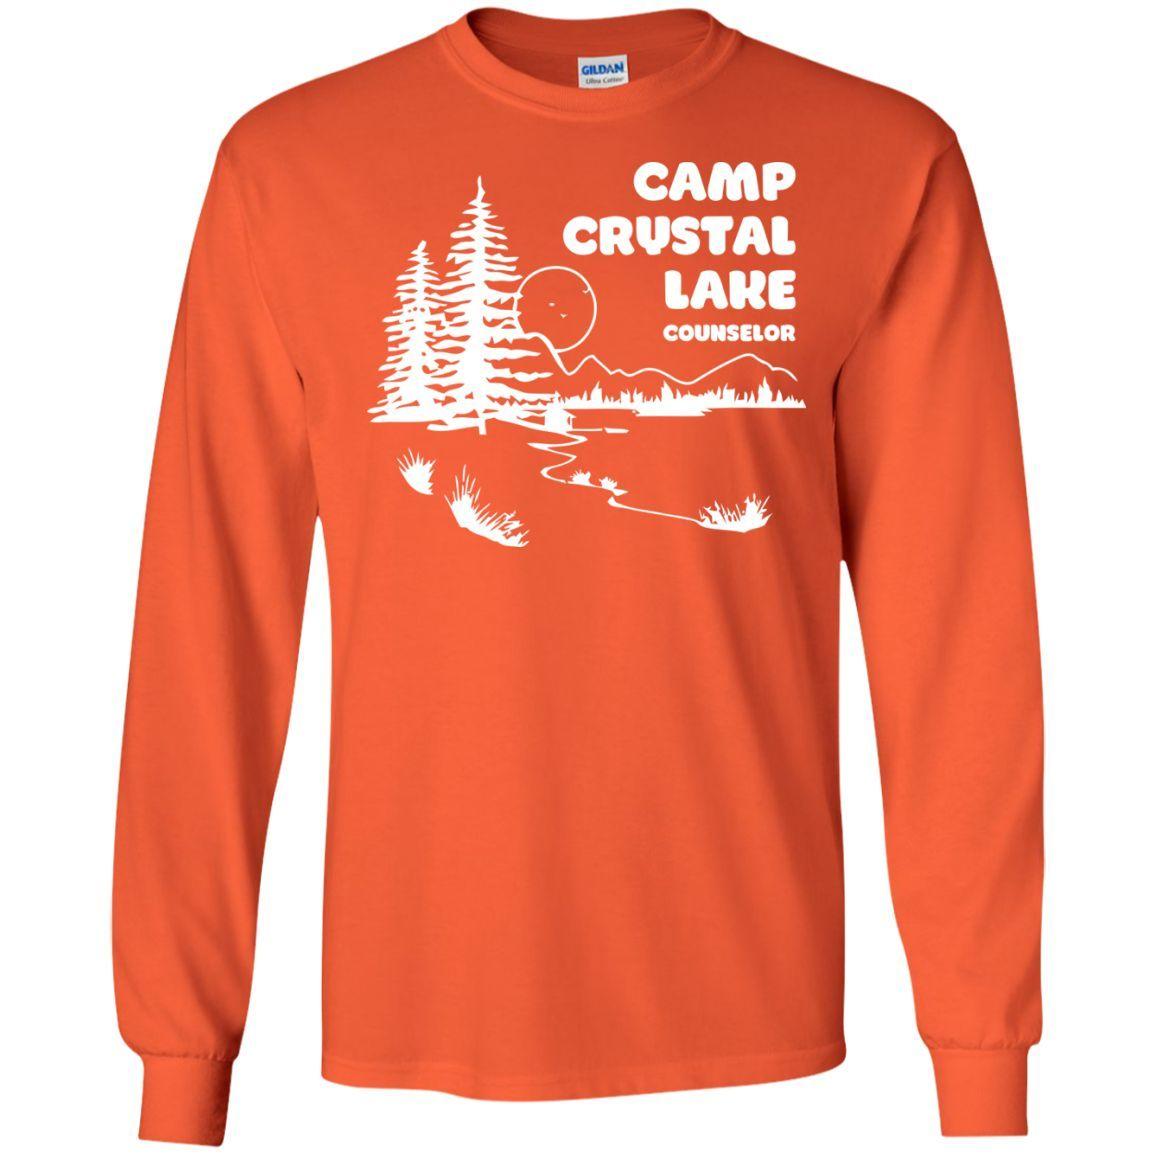 Camp Crystal Lake T-Shirt funny saying sarcastic movie humor (2)-01 LS Ultra Cotton Tshirt